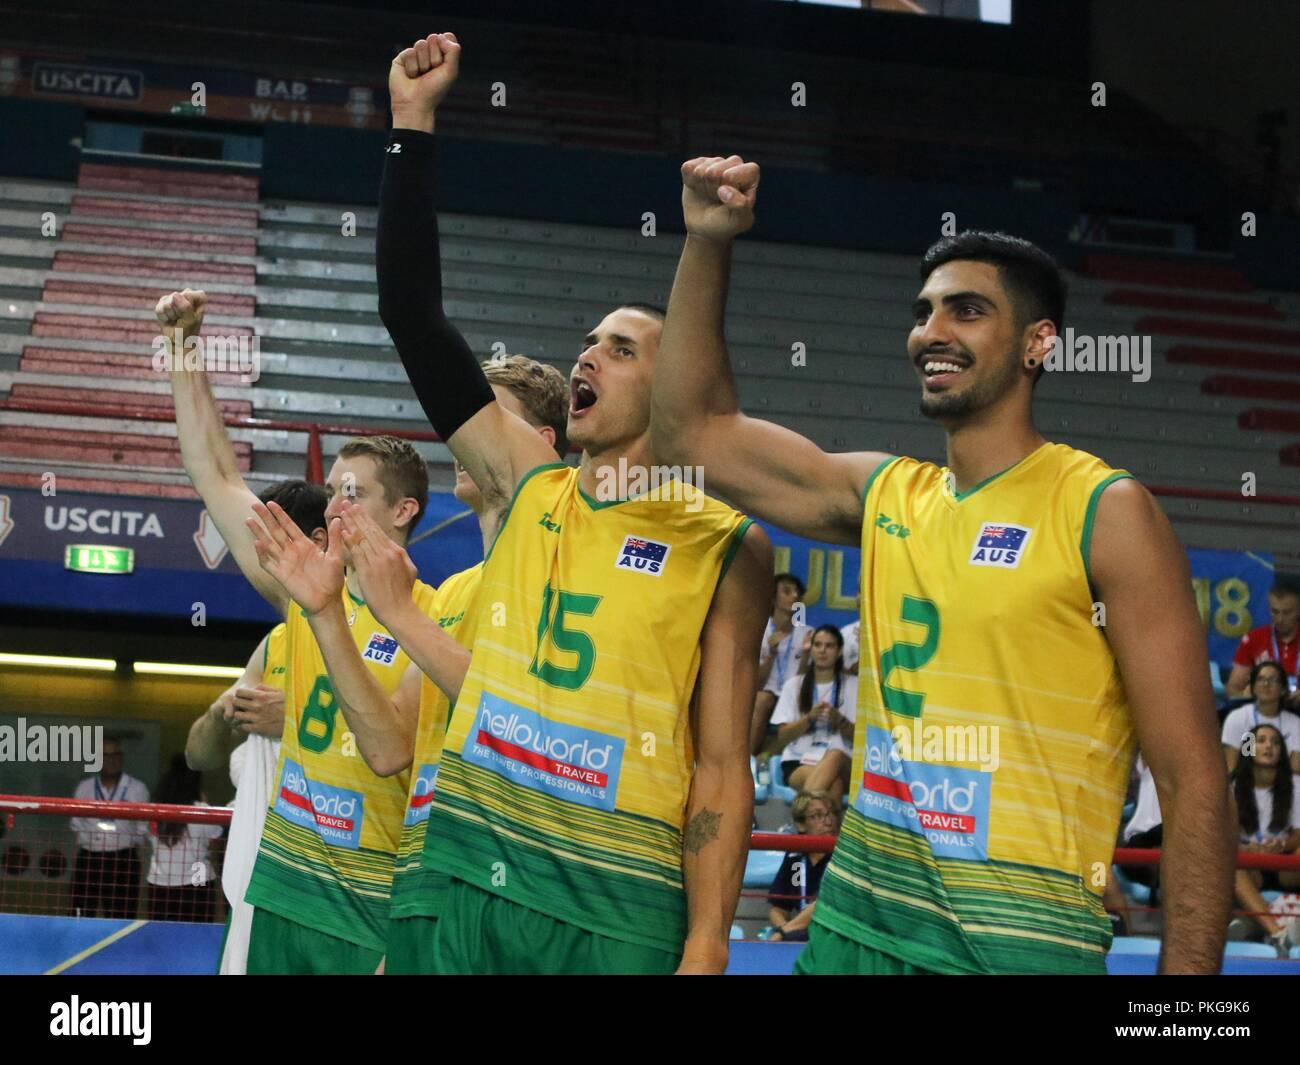 Bari (Italy), 13th September 2018: Australia bench players support their teammates during pool C match Australia vs USA at FIVB Volleyball Men's World Championship 2018. Credit: NICOLA MASTRONARDI/Alamy Live News - Stock Image